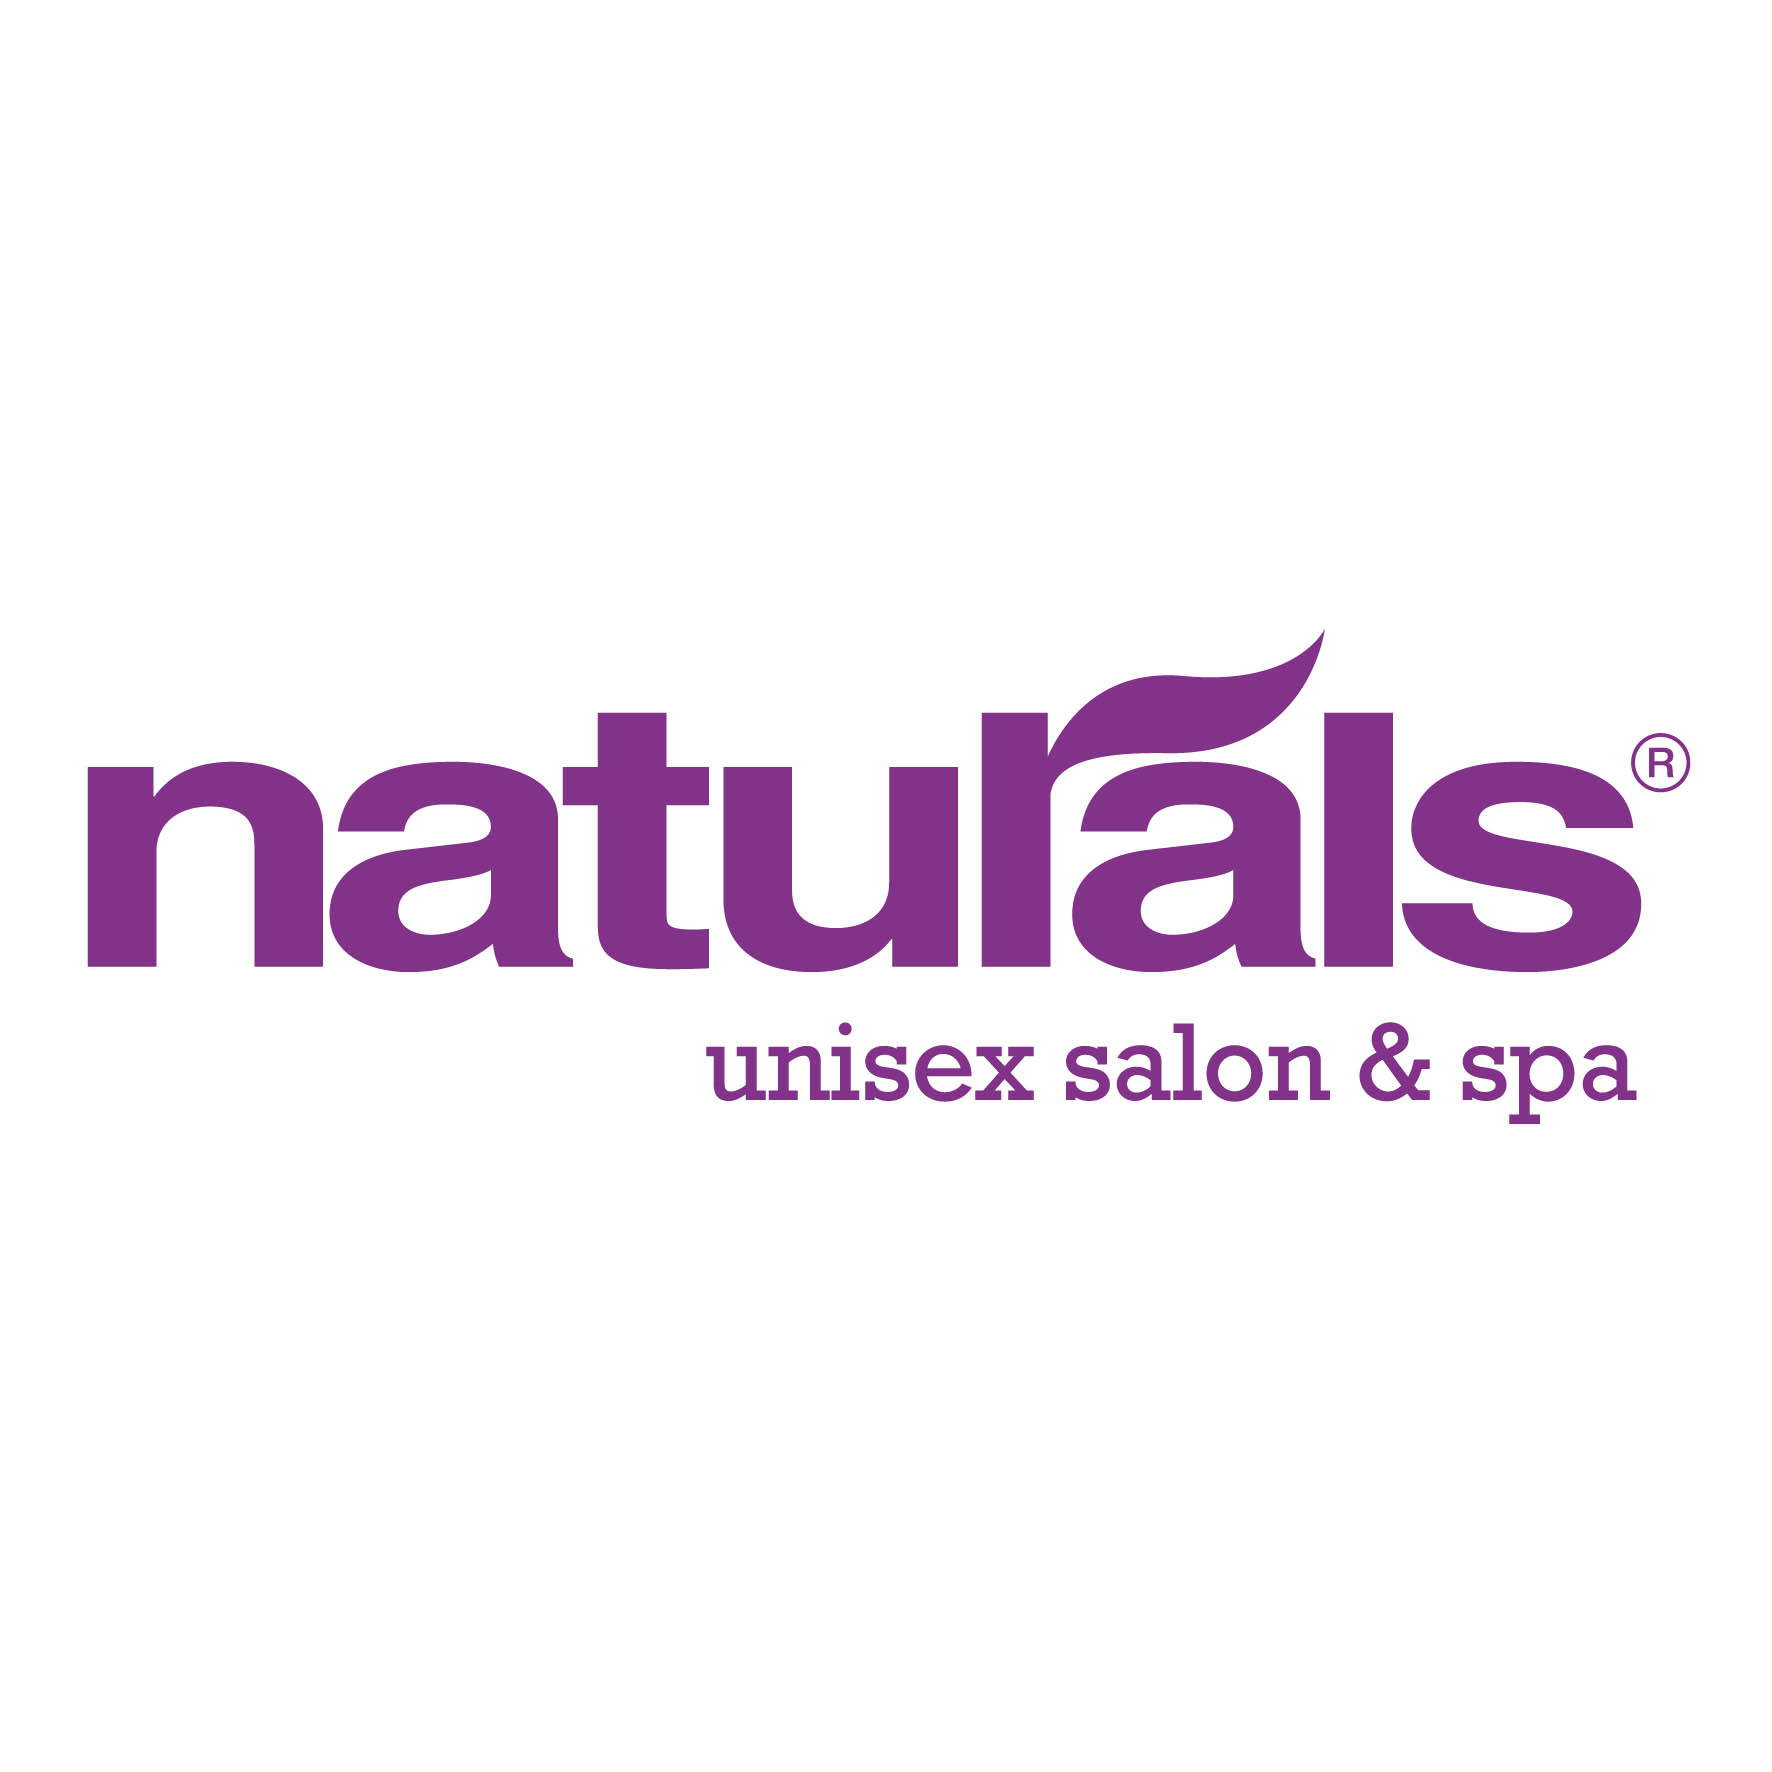 Naturals Family Salon Spa - Mylapore - Chennai Image